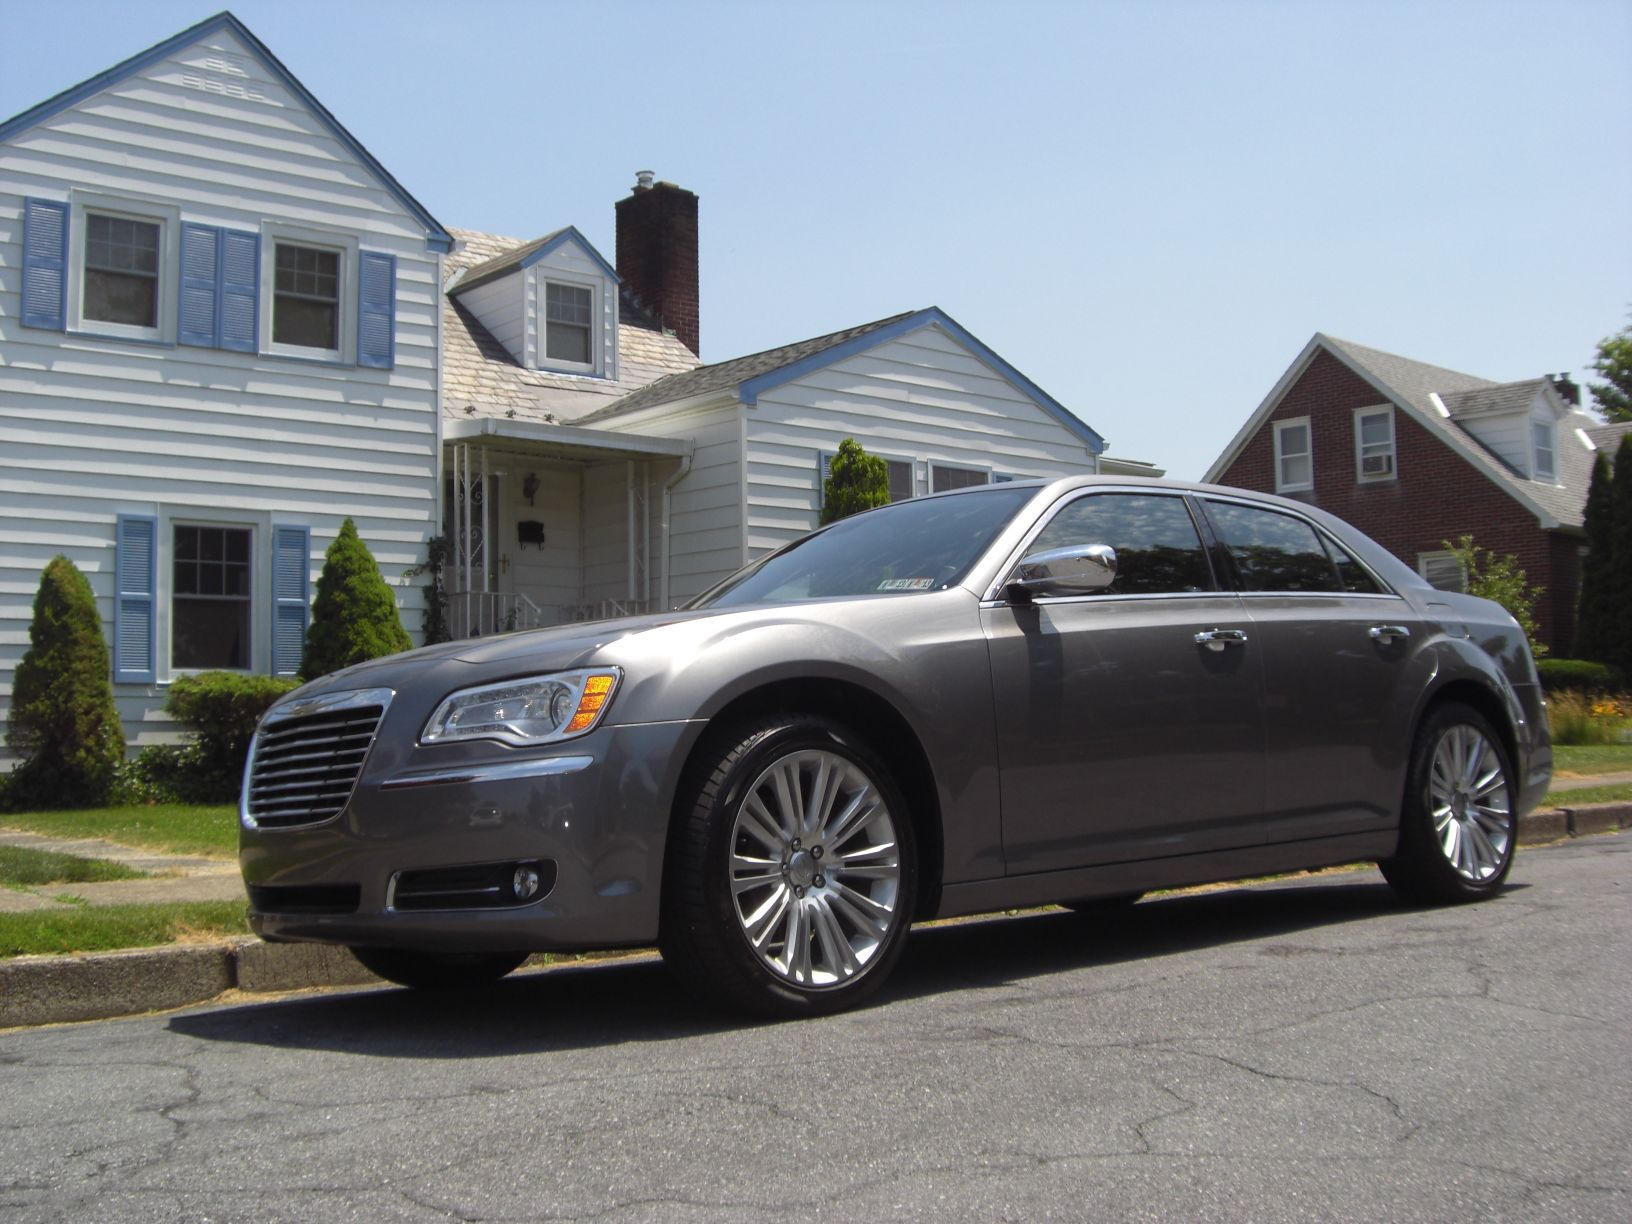 Chrysler 300 C Hemi 2011 American Cars And Parts